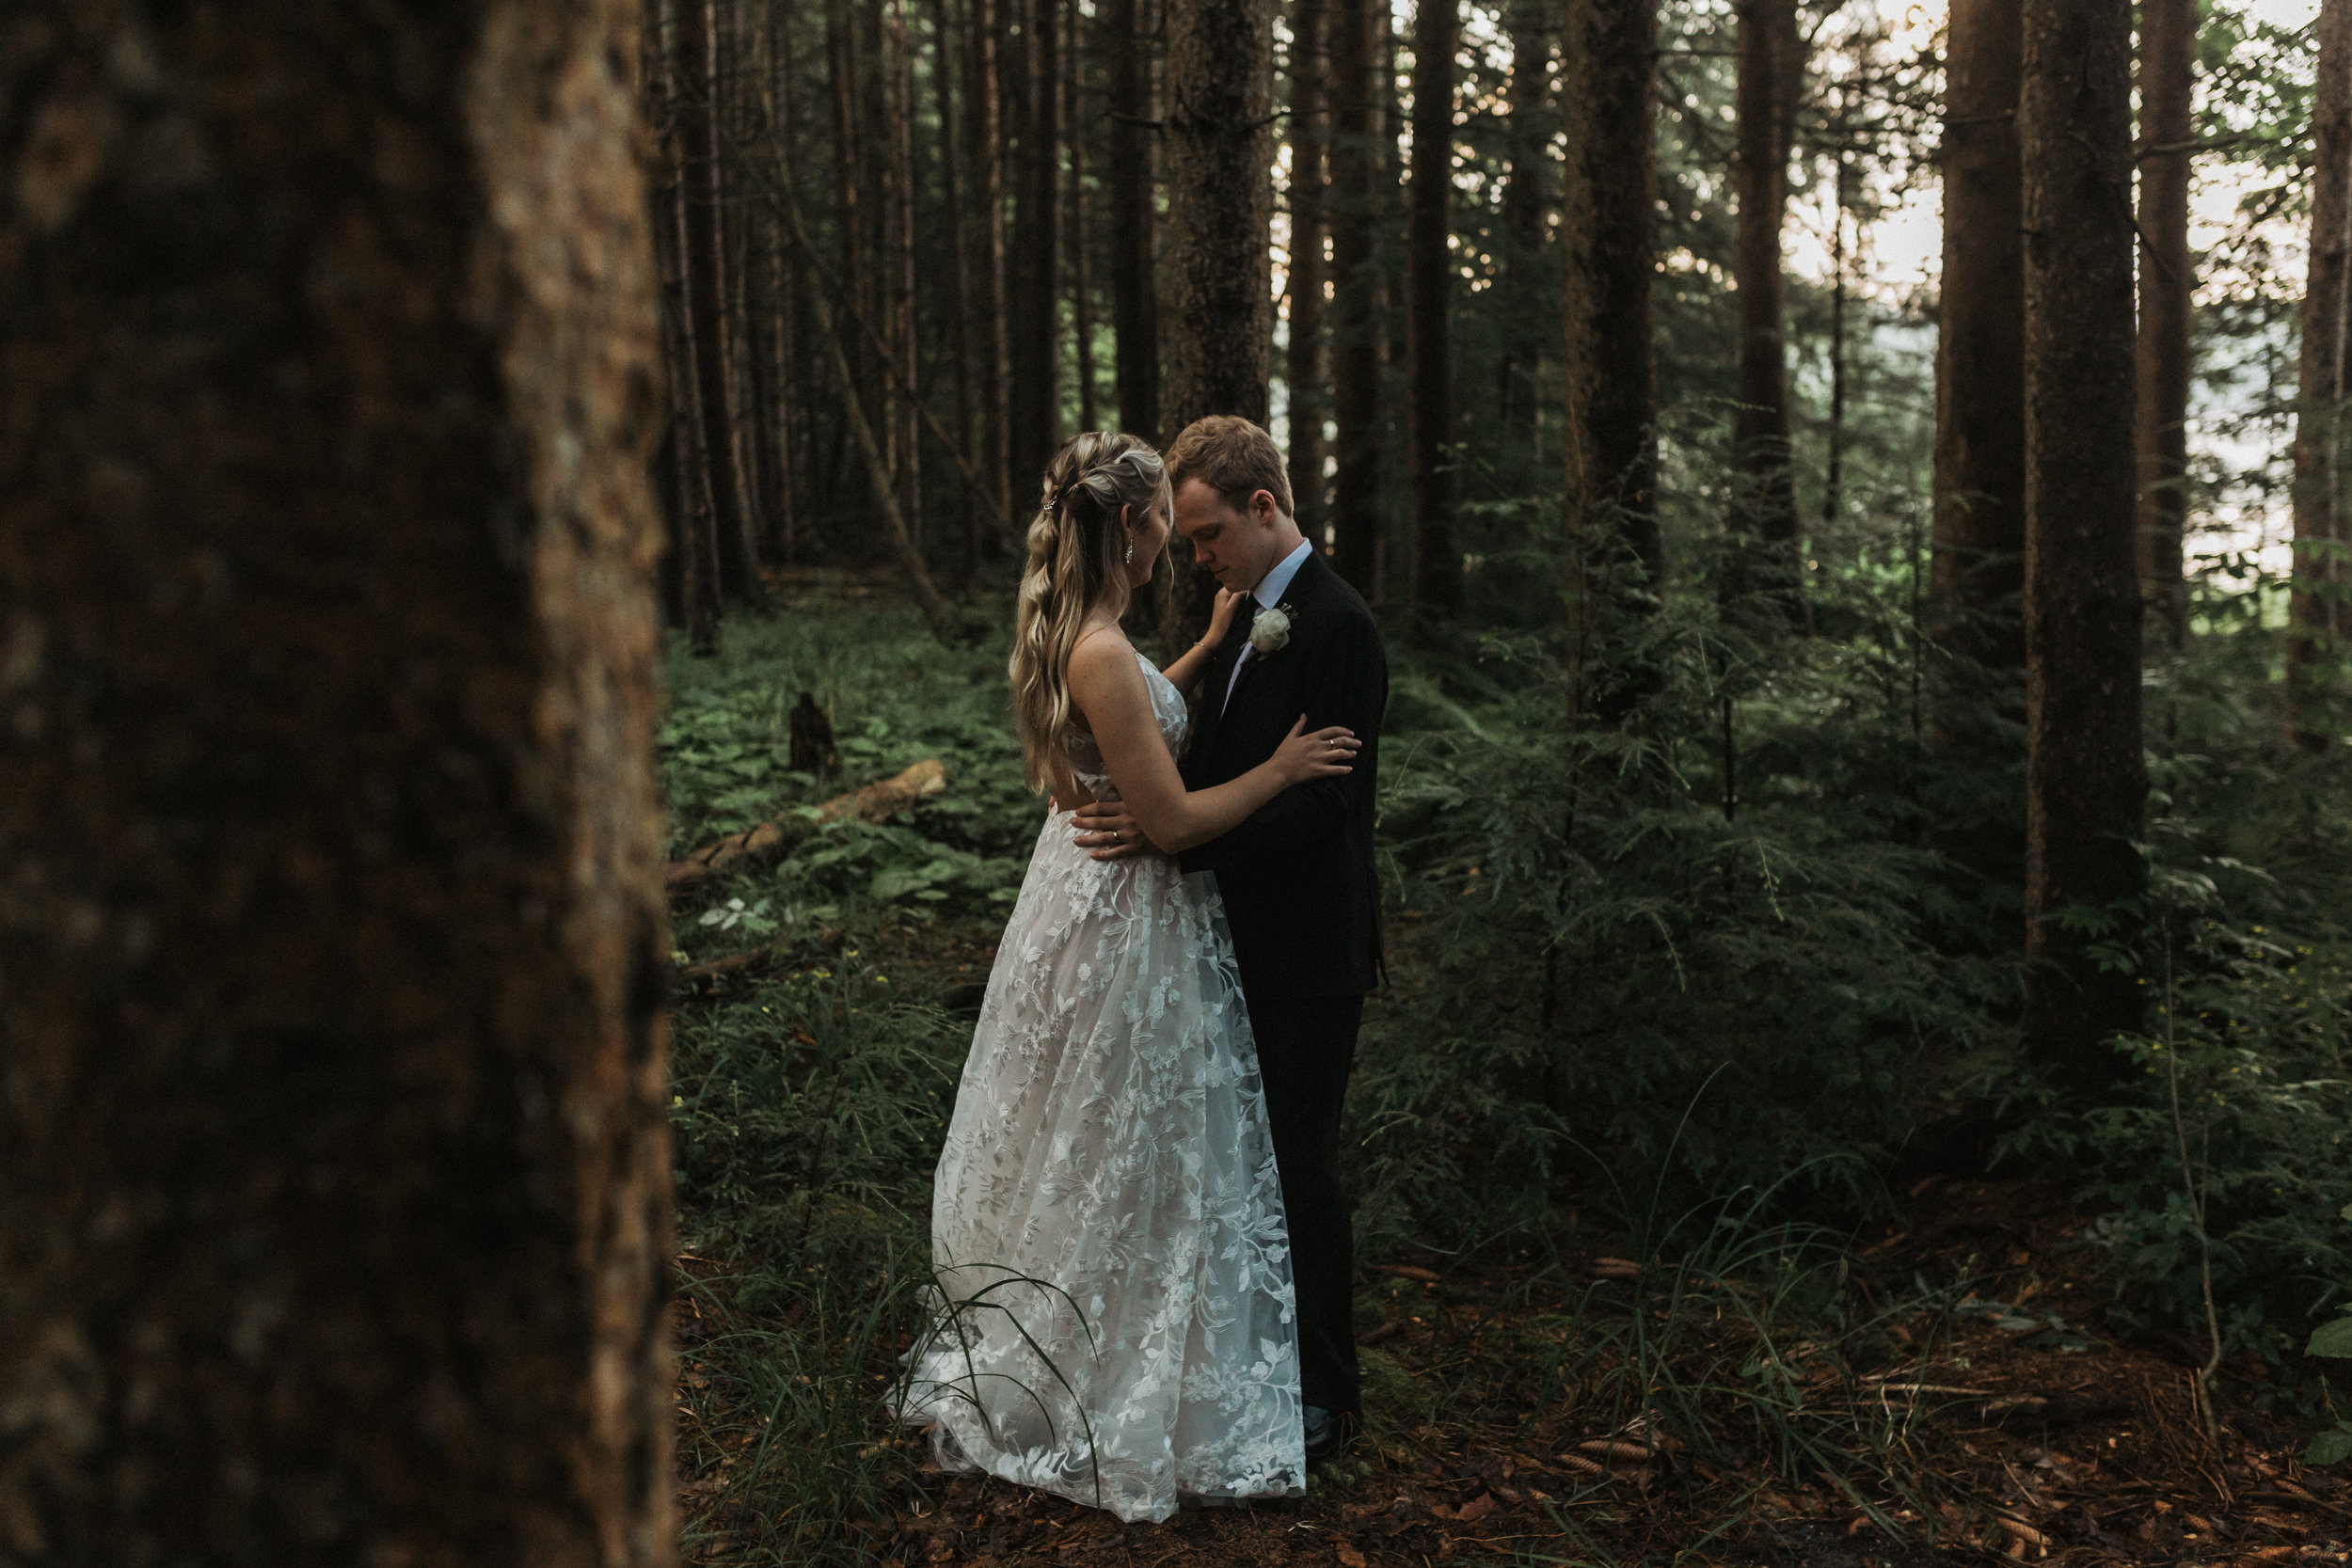 greywacke-meadows-wedding-79.jpg